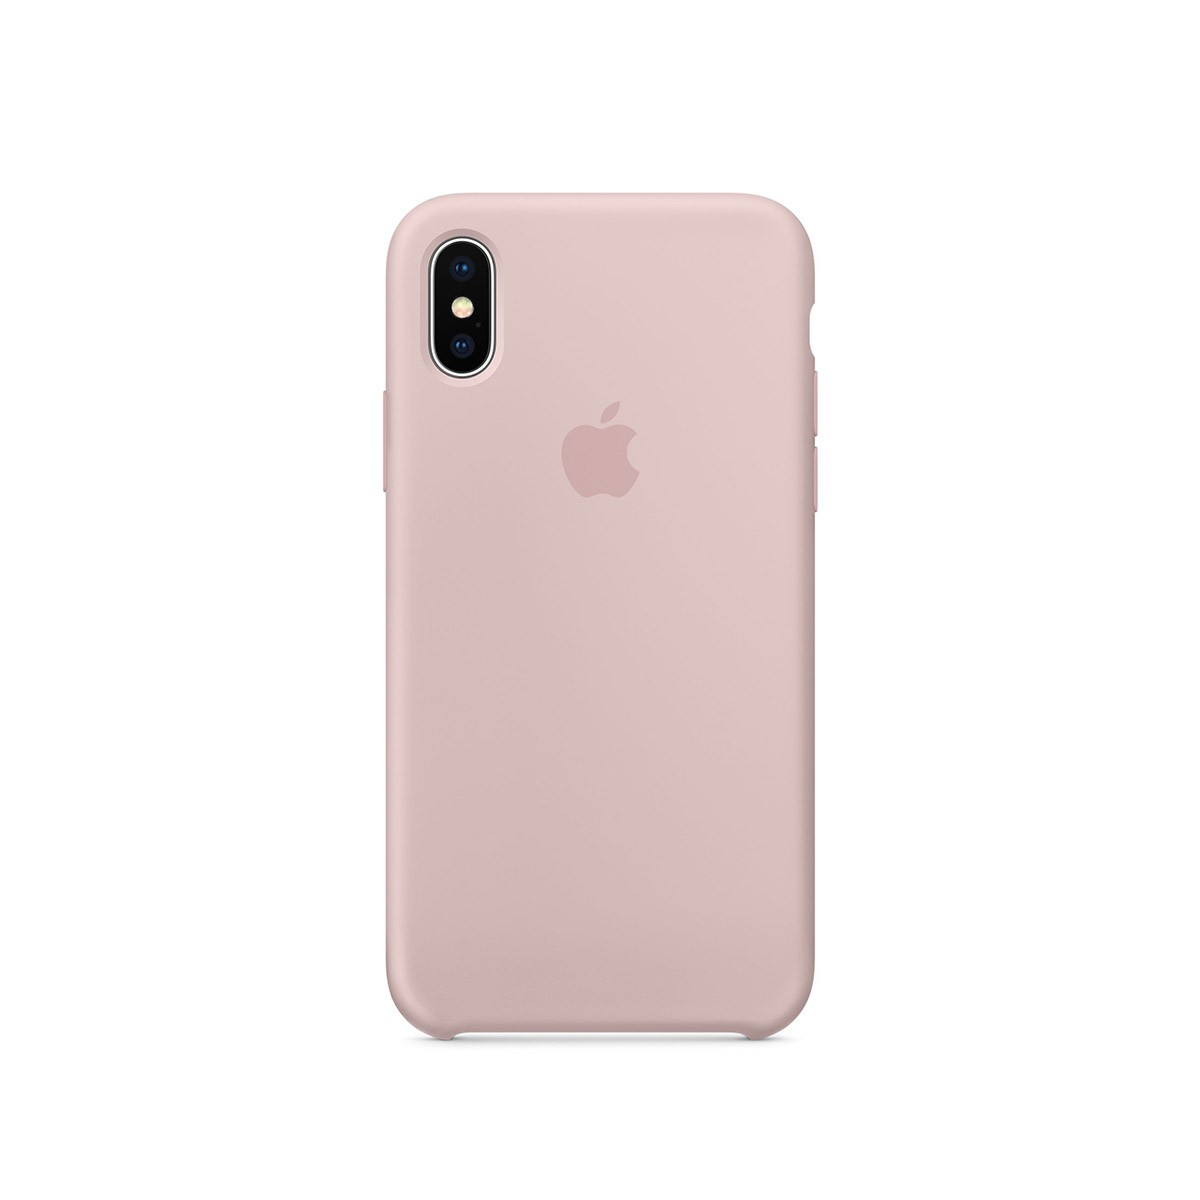 Apple silikonový kryt na iPhone X – pískově růžový